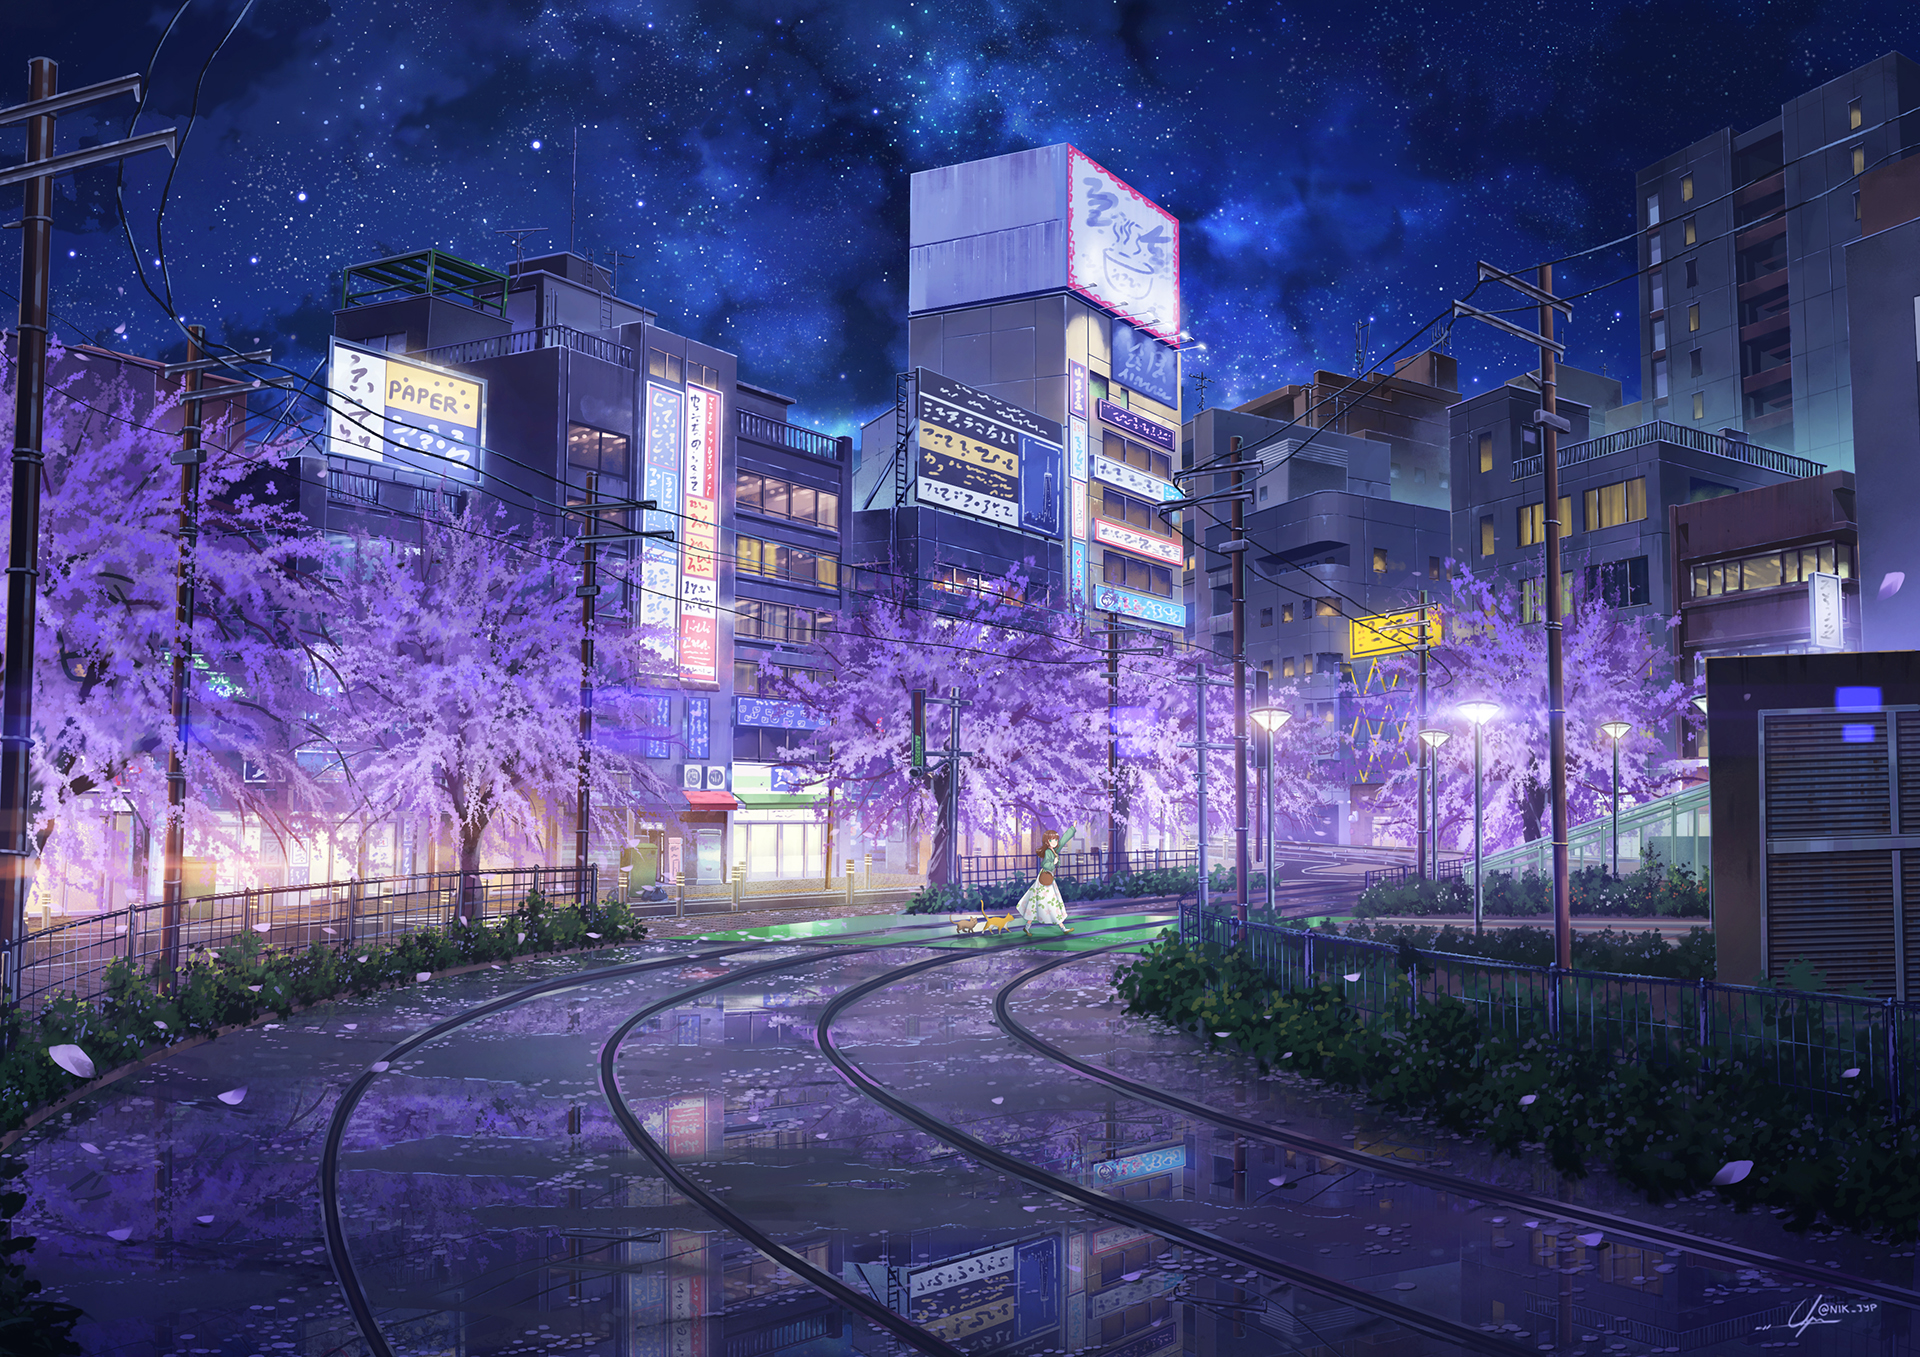 Girl Street City Building Tree Night 1920x1357